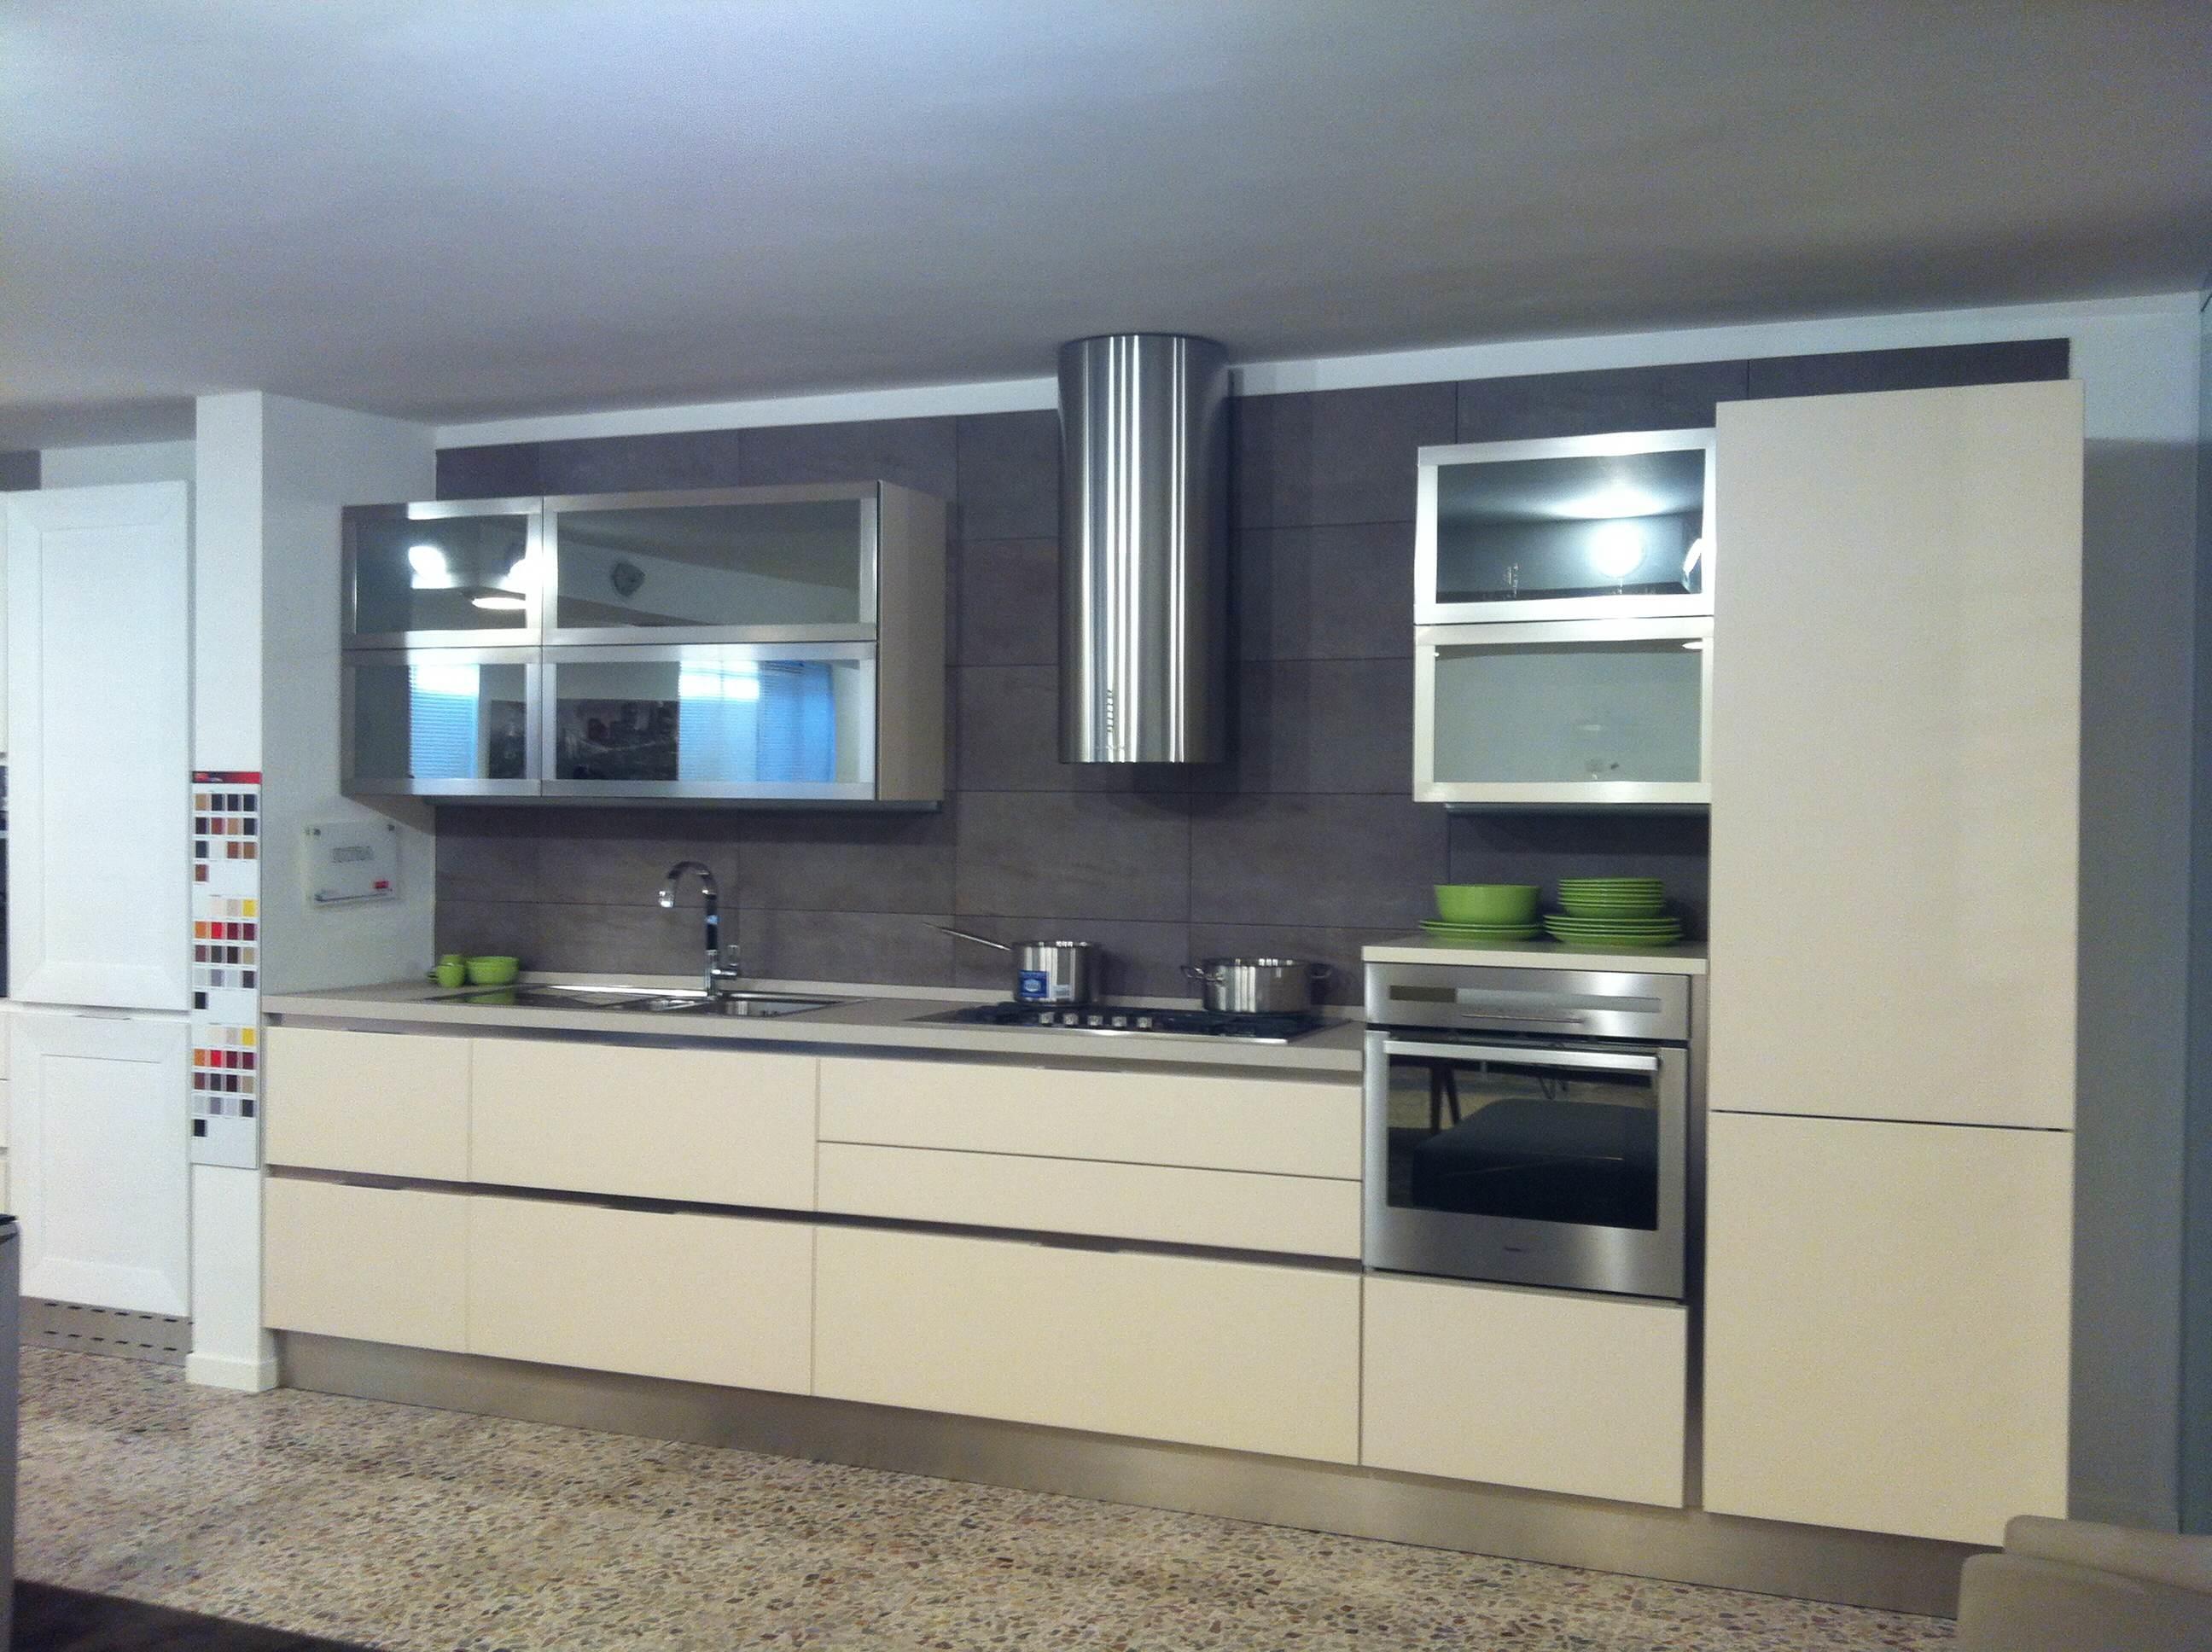 Outlet Cucine Milano E Provincia. Cucina Sistematica In Offerta ...